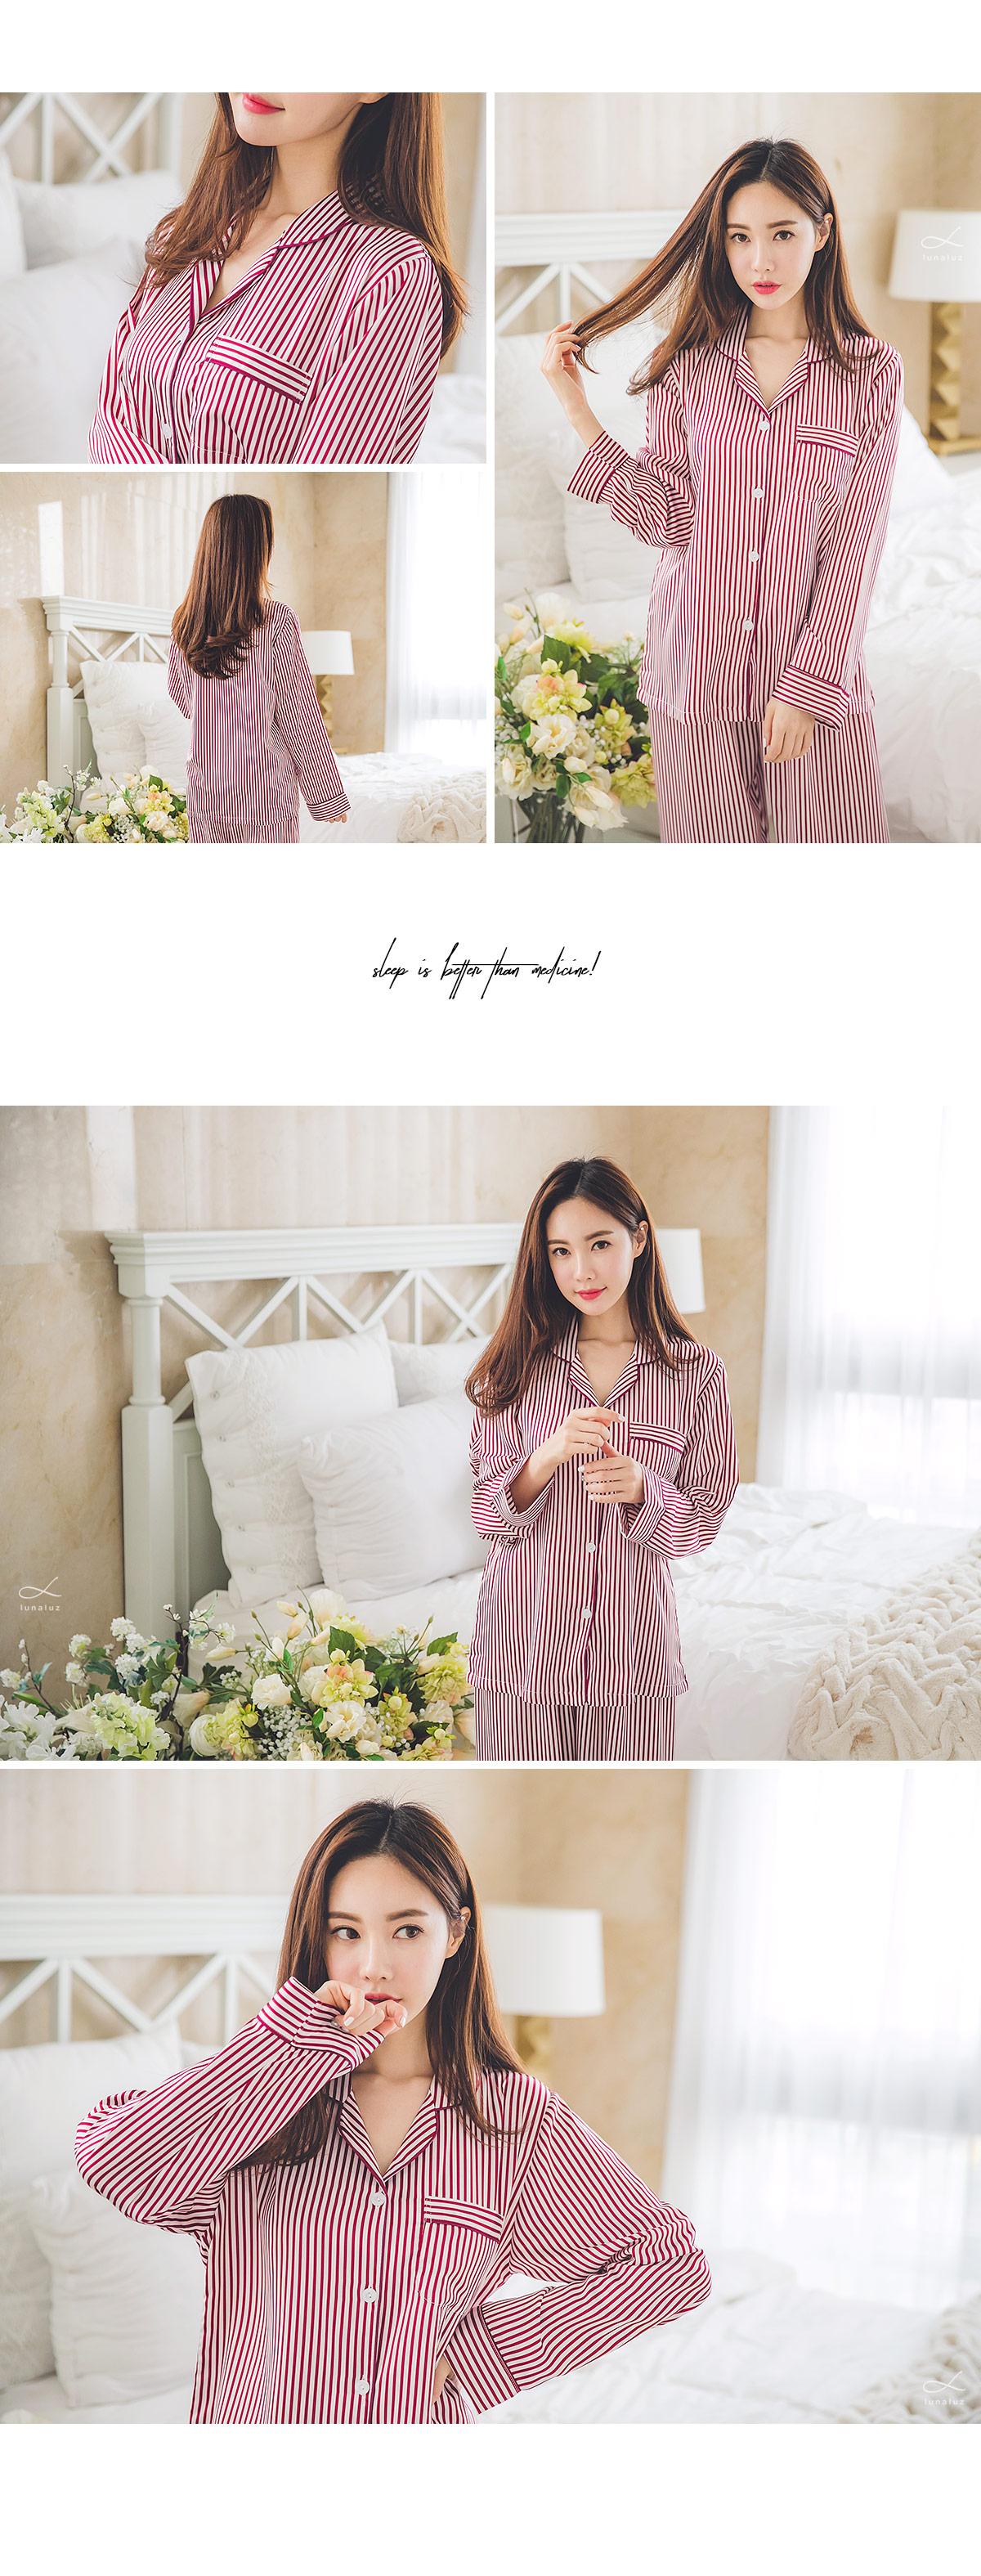 DTY 샤무즈 스트라이프 투피스 여성잠옷 - 쿠비카, 67,000원, 잠옷, 여성파자마